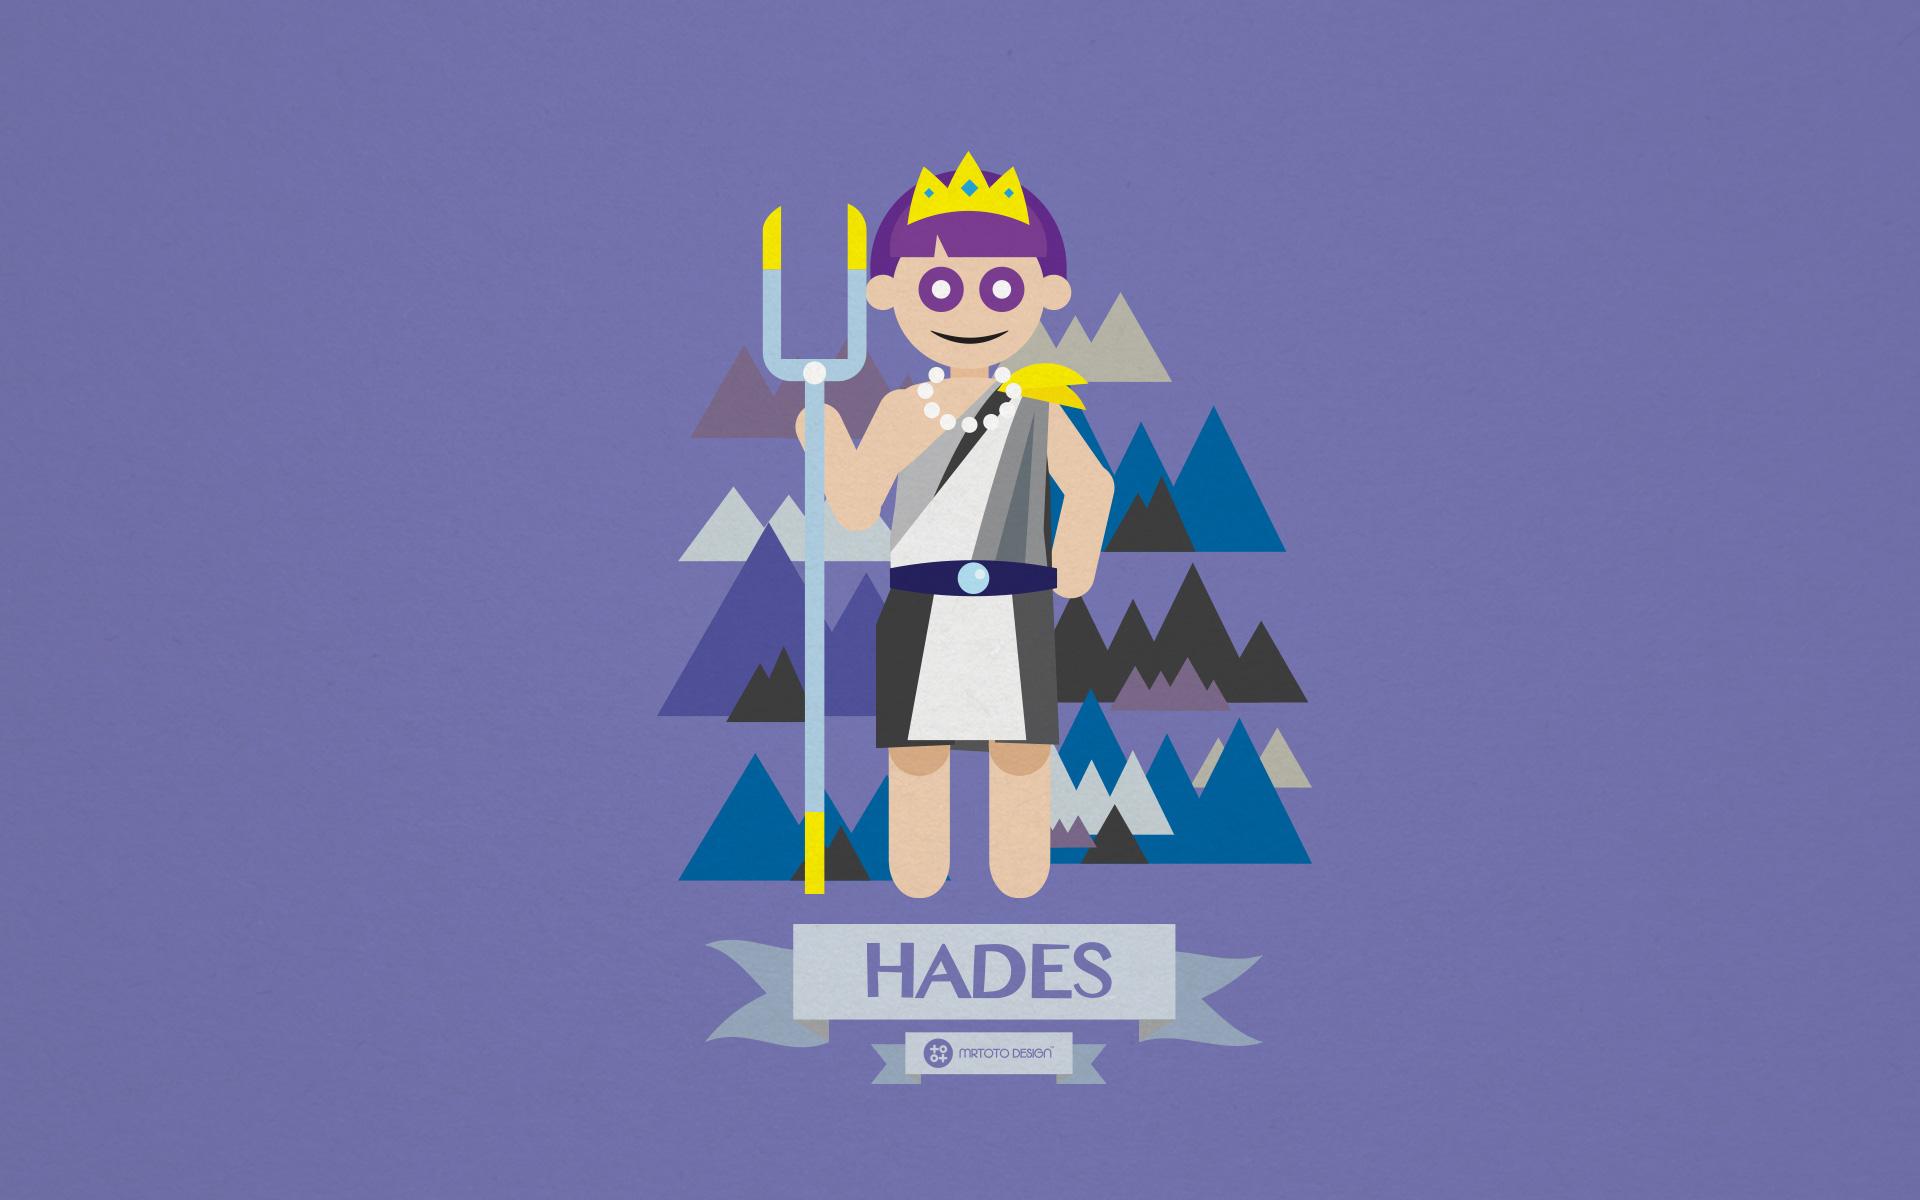 Greek Mythology Collection Hades